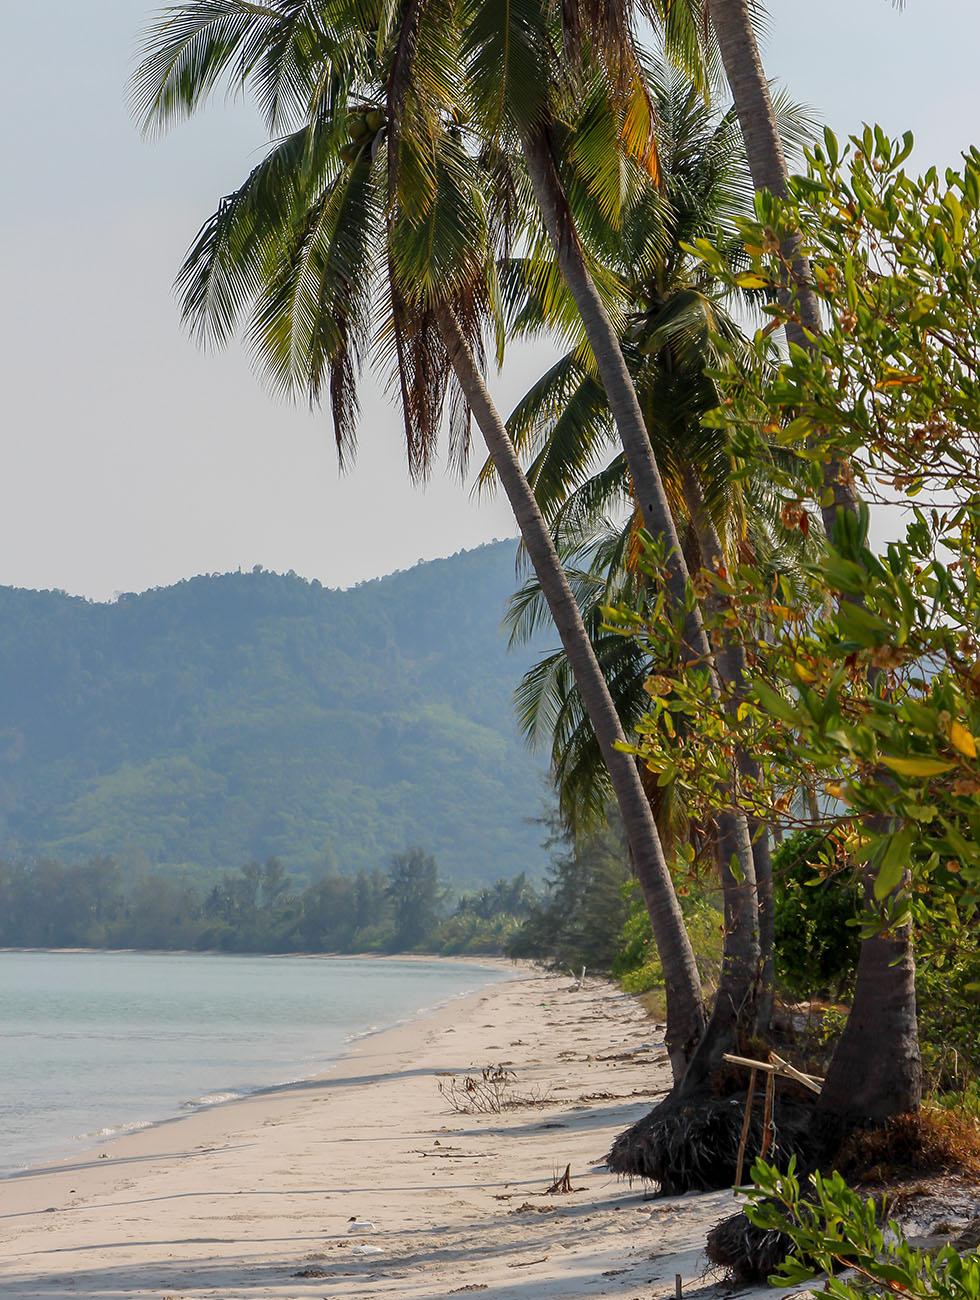 White sandy beaches at Koh Yao Yai